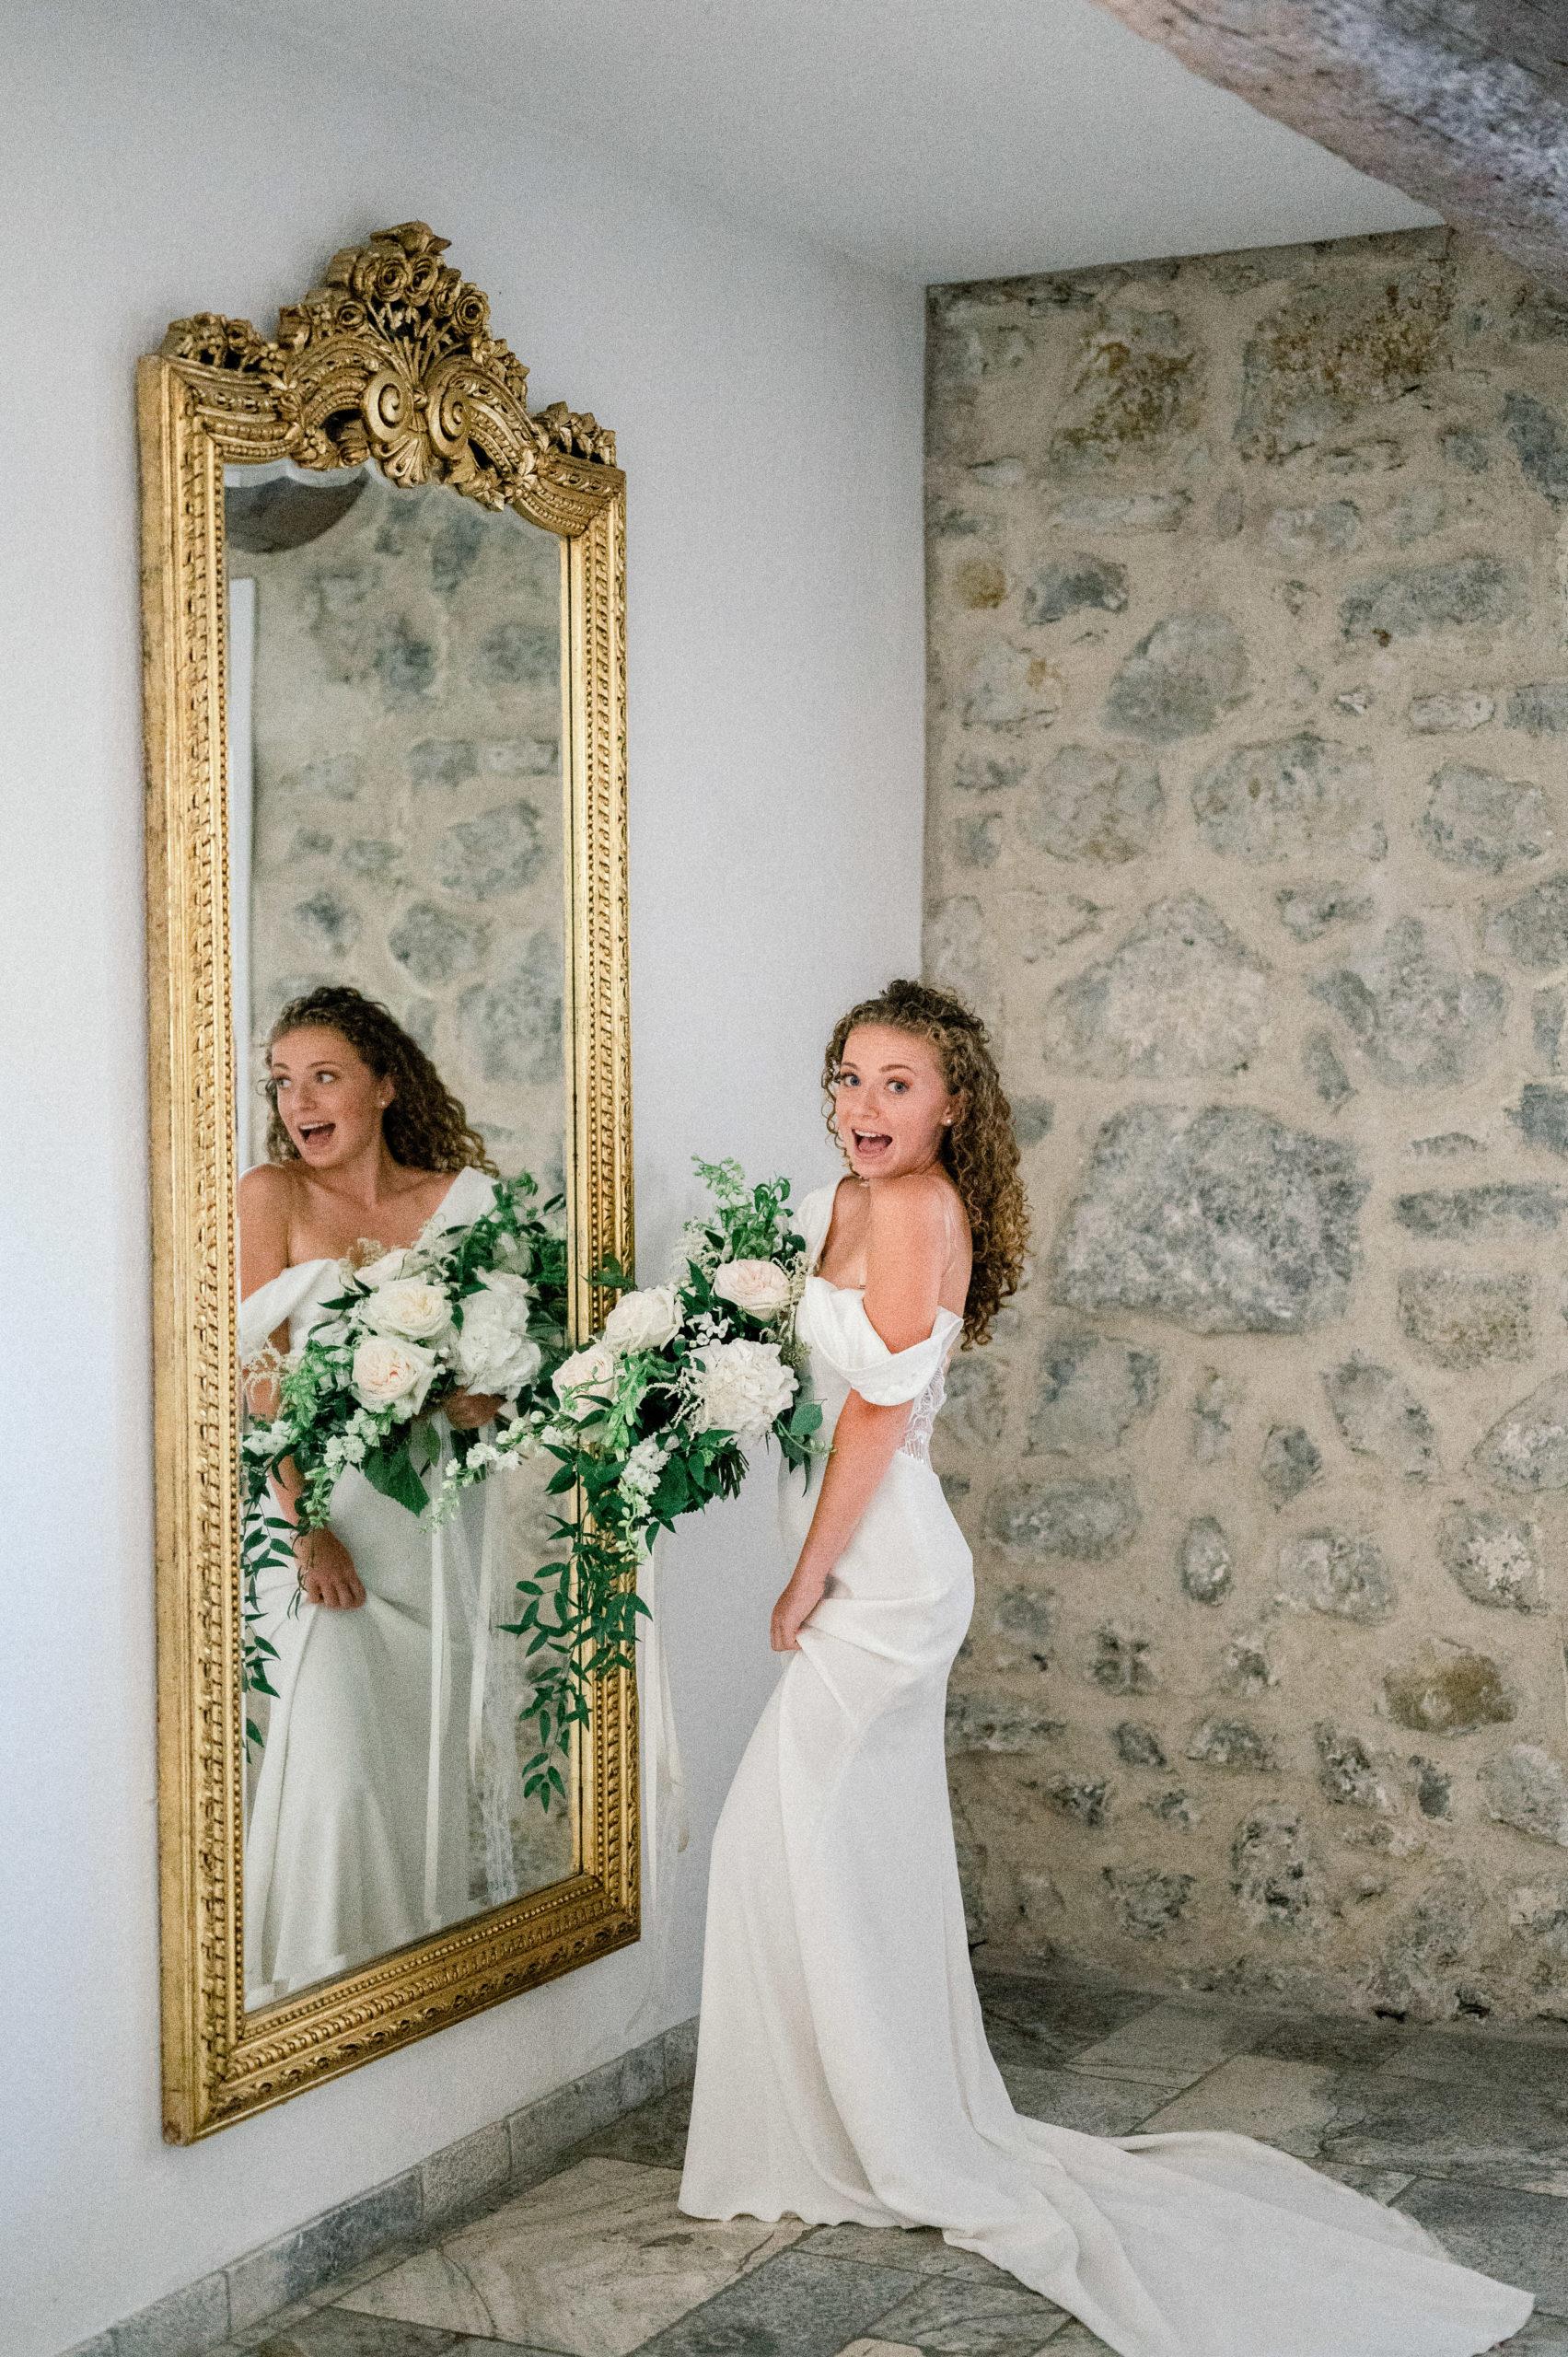 Mariée en plein mariage à Sisteron